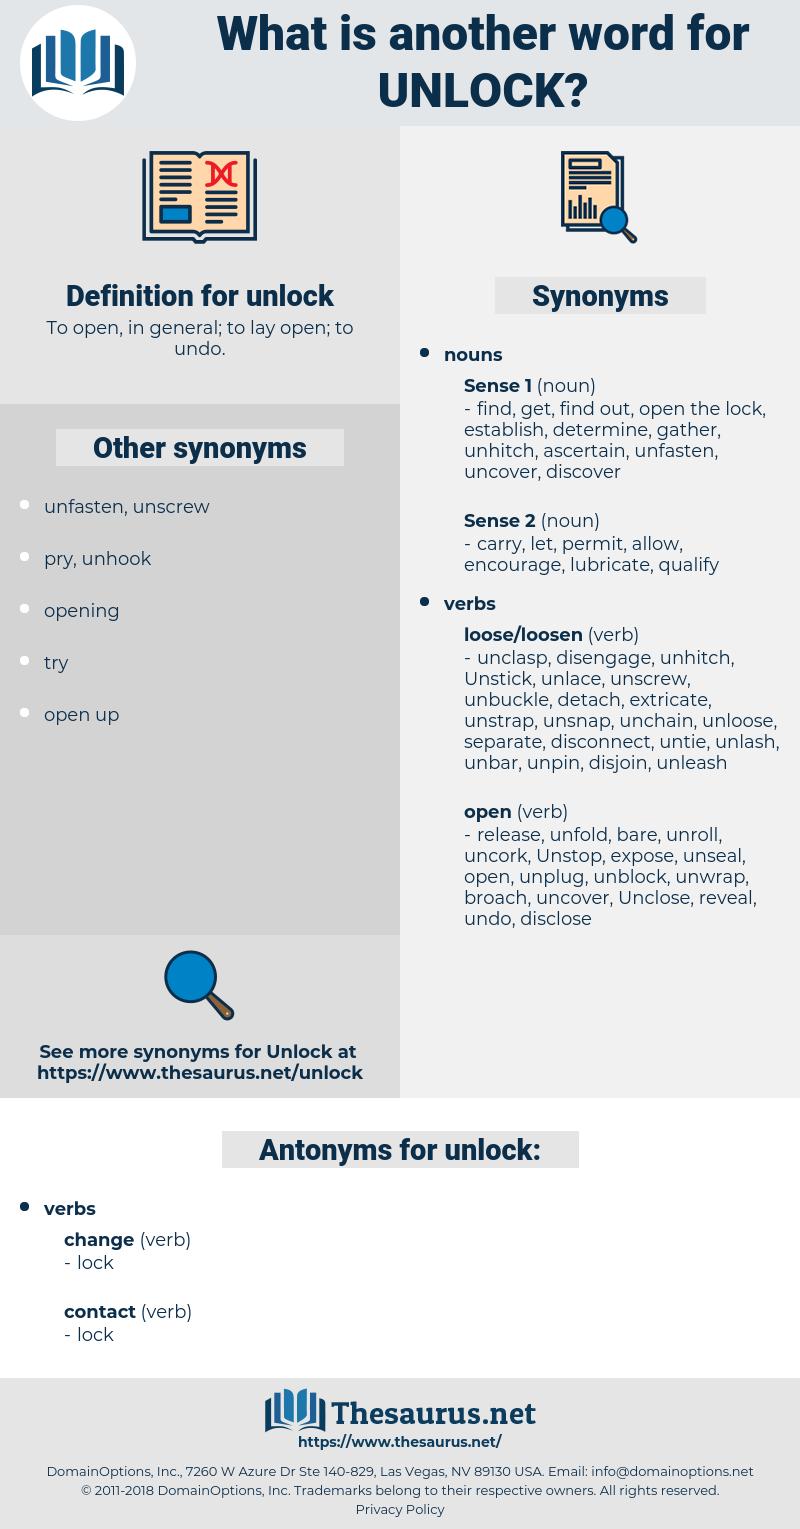 unlock, synonym unlock, another word for unlock, words like unlock, thesaurus unlock